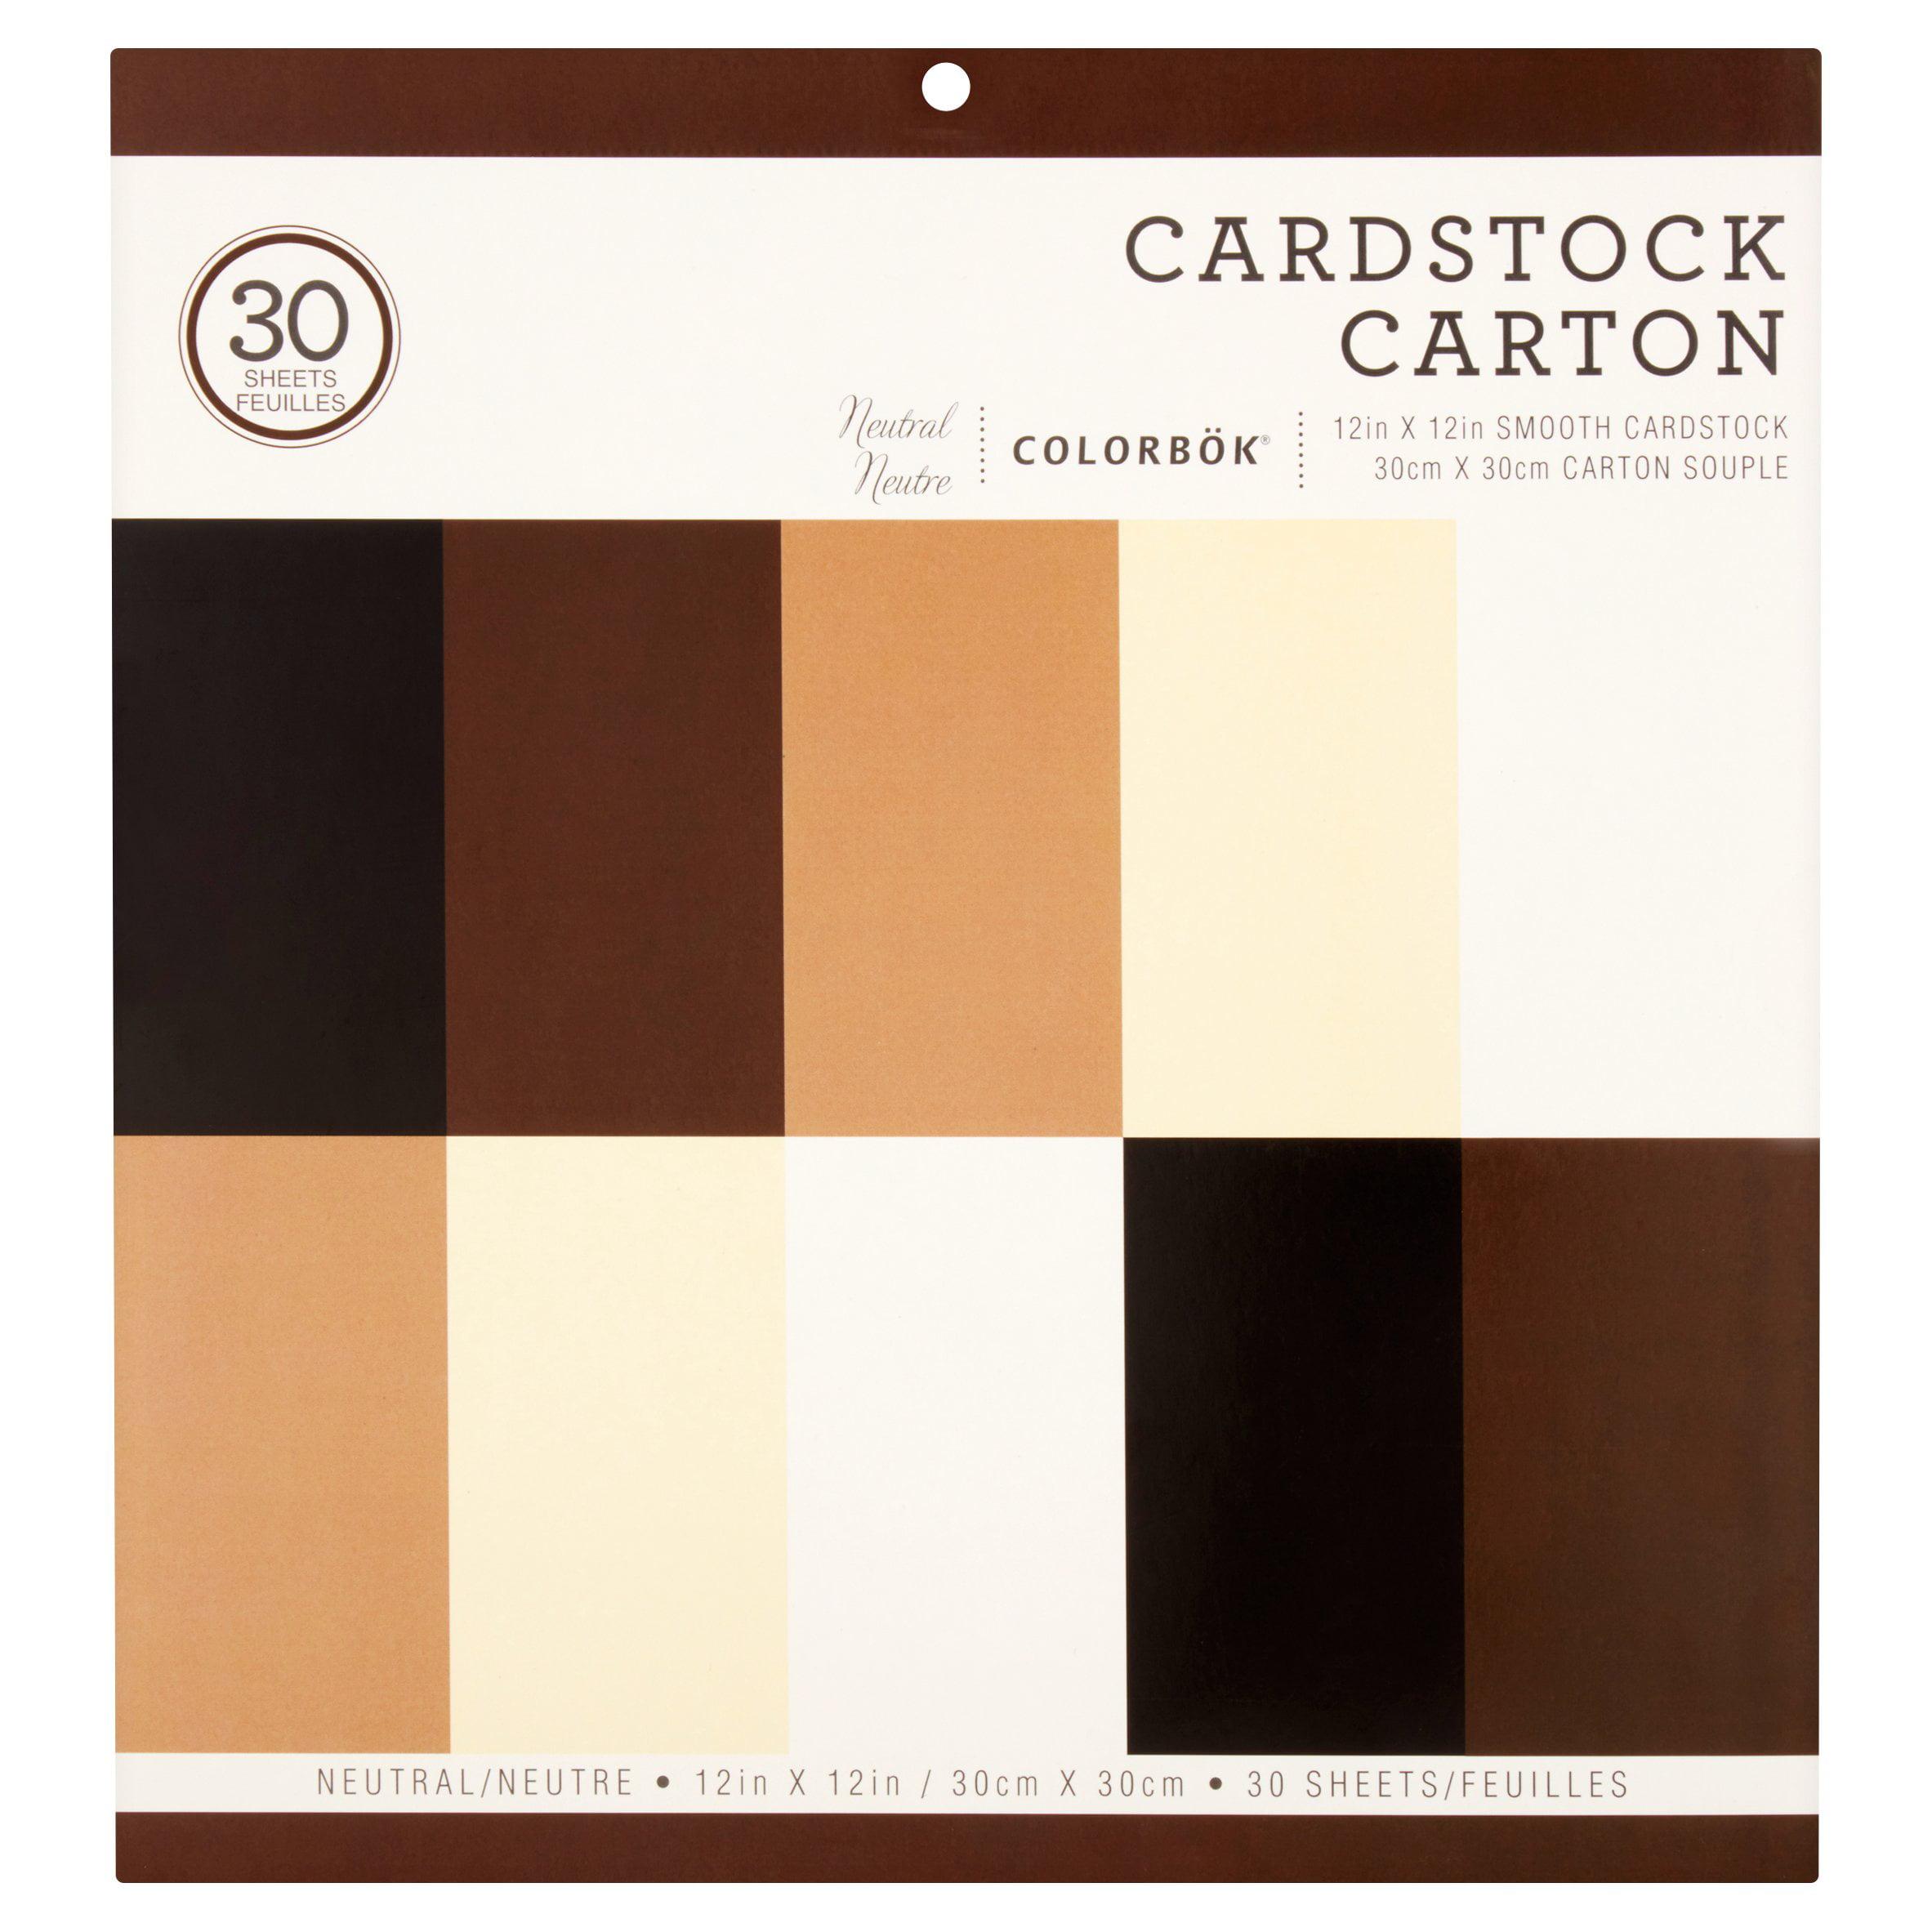 Colorbök Neutral Cardstock Carton Sheets, 30 count